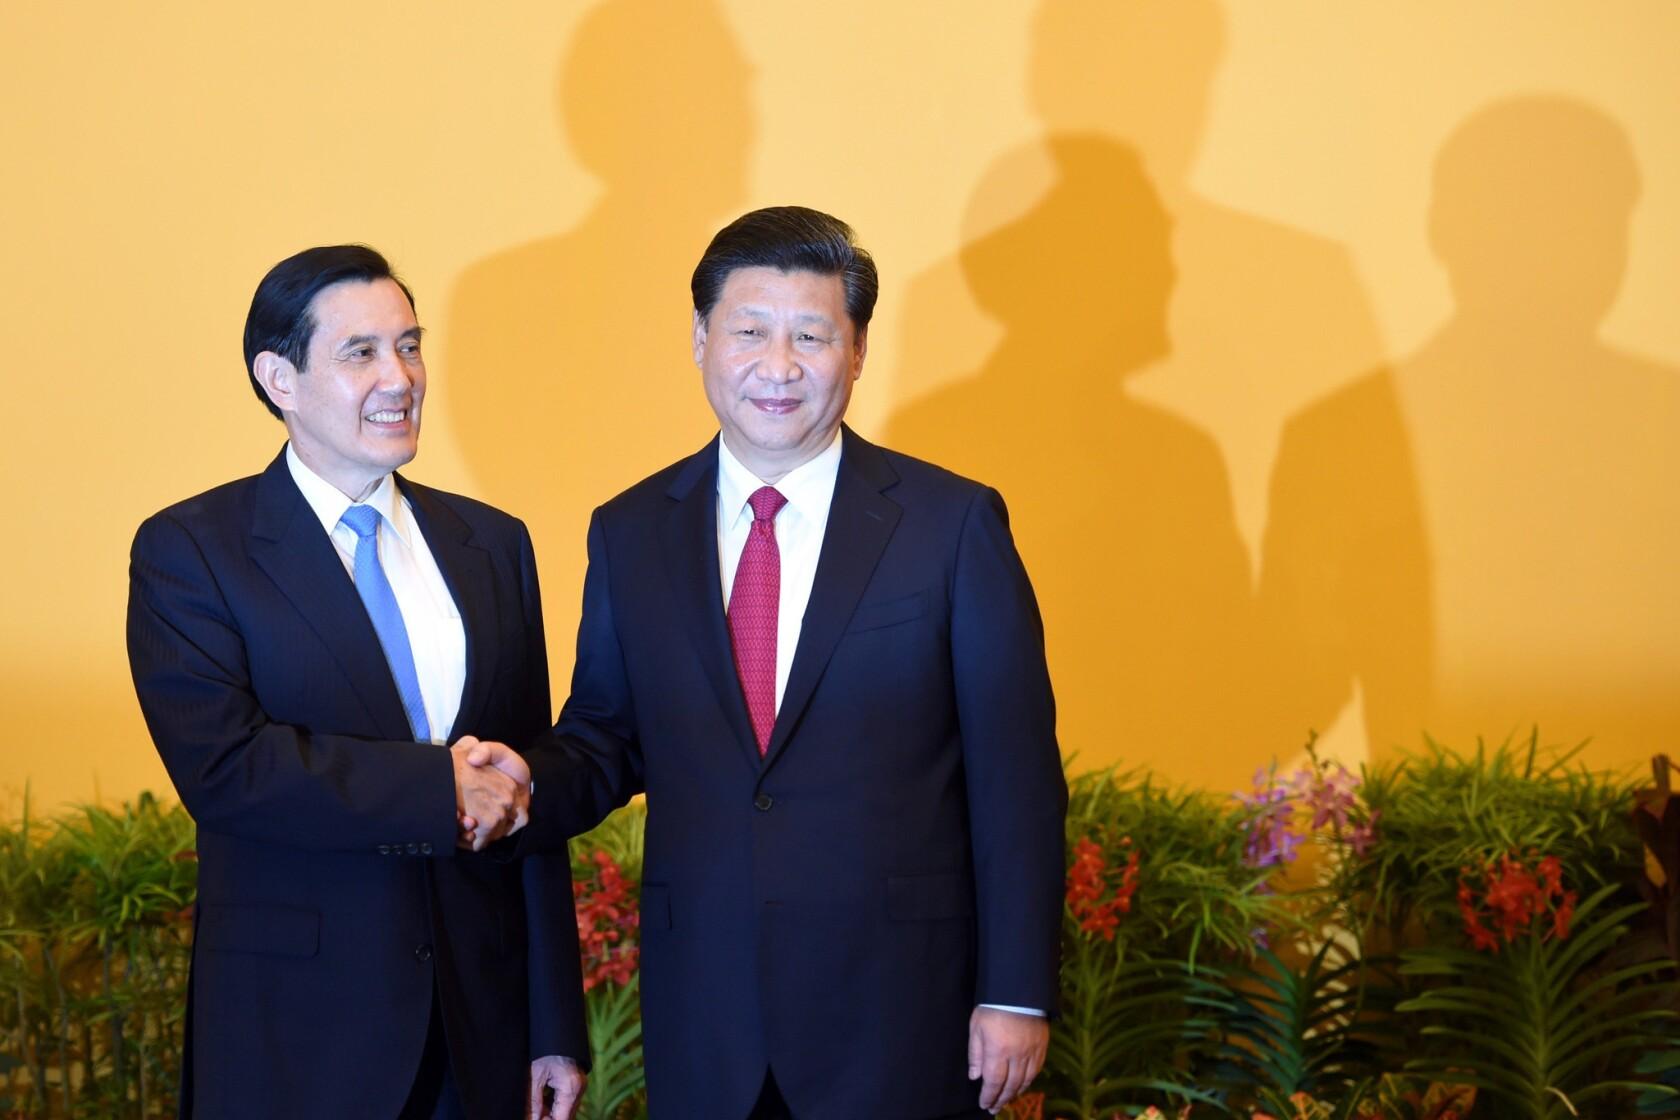 Historic handshake marks meeting of China and Taiwan presidents